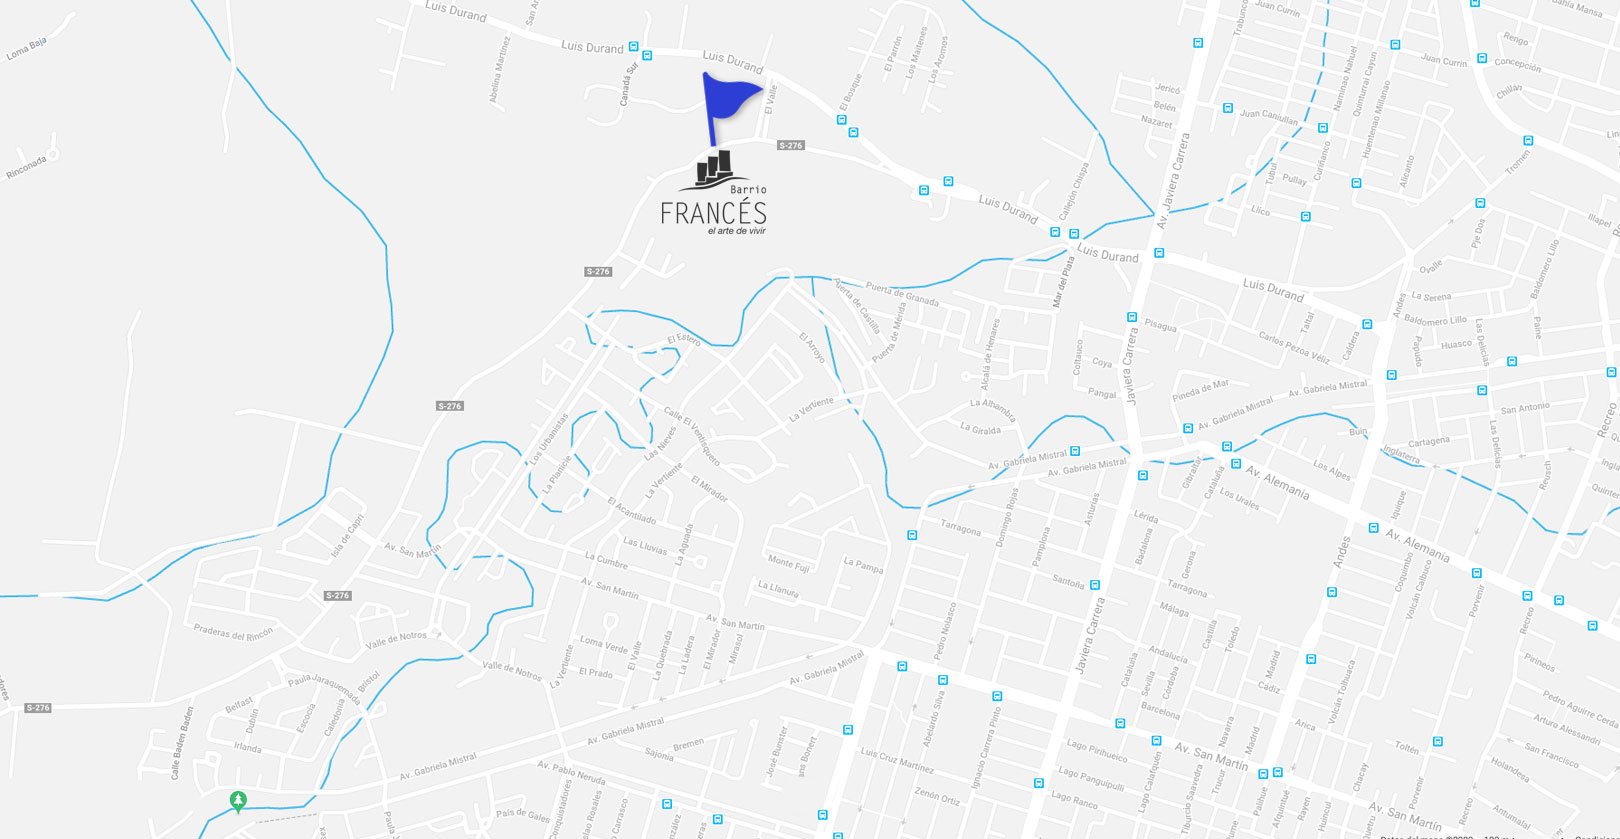 Condominio Versalles Mapa-Dubois